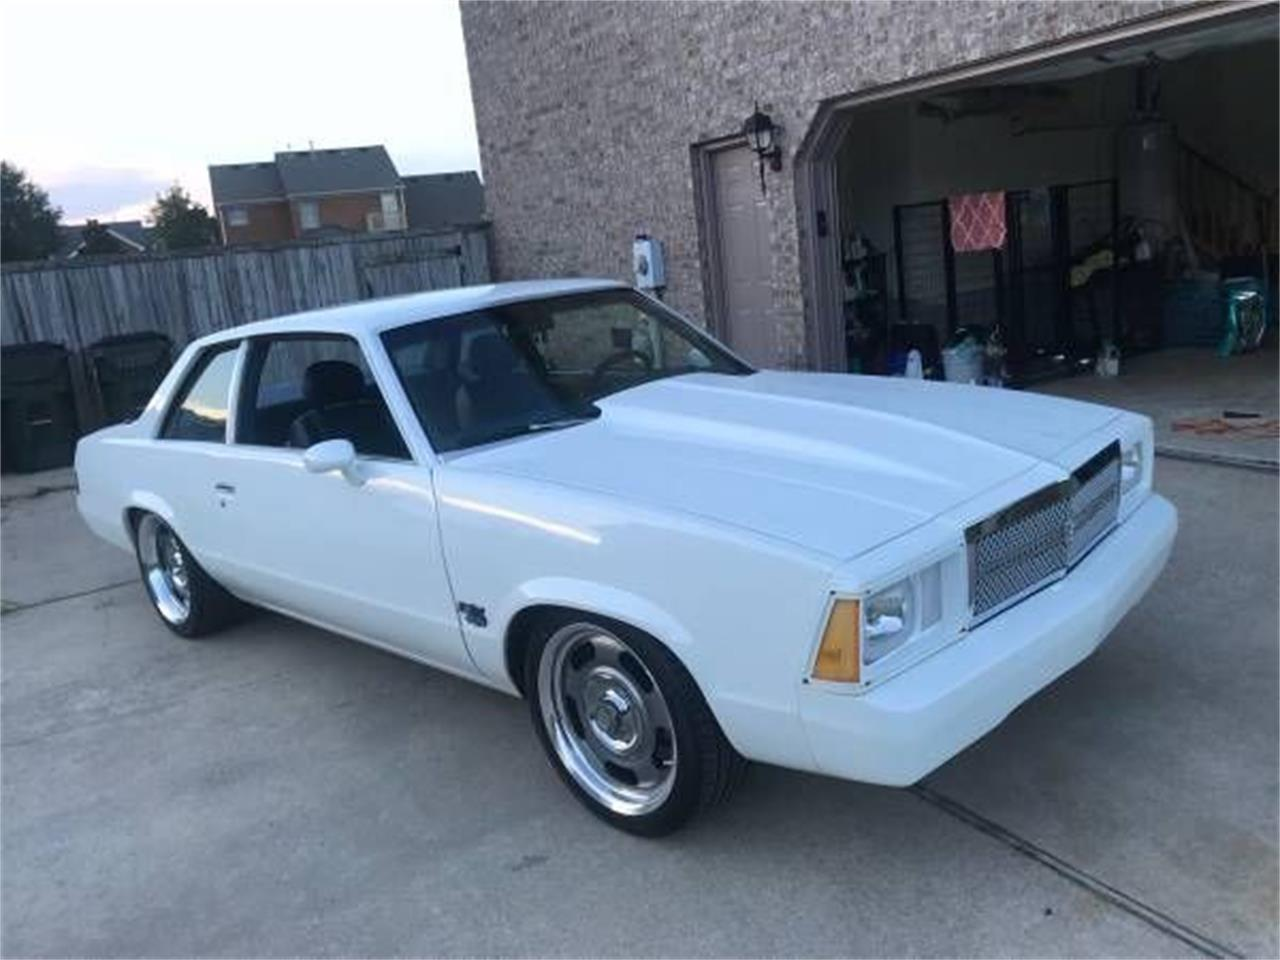 1980 Malibu Dash